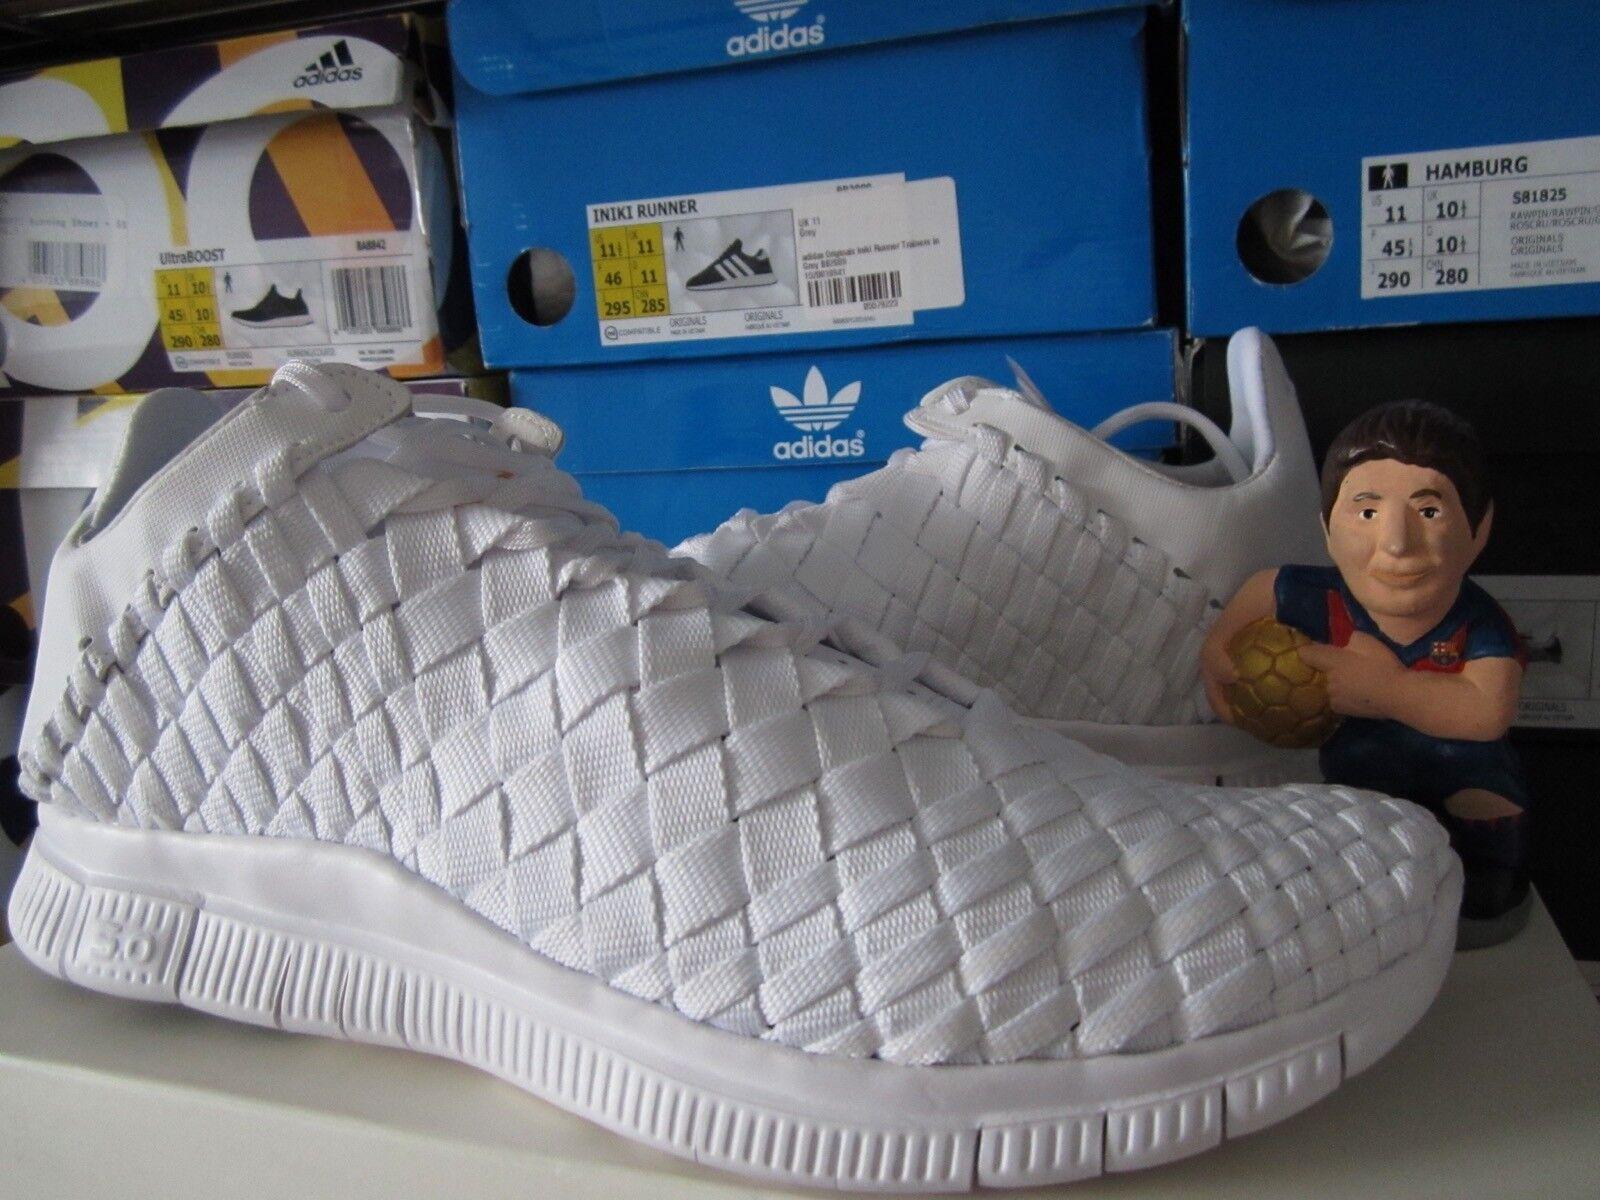 Nike Free Inneva Woven Tech SP White?705797-110 DS Size 11 Flyknit Primeknit